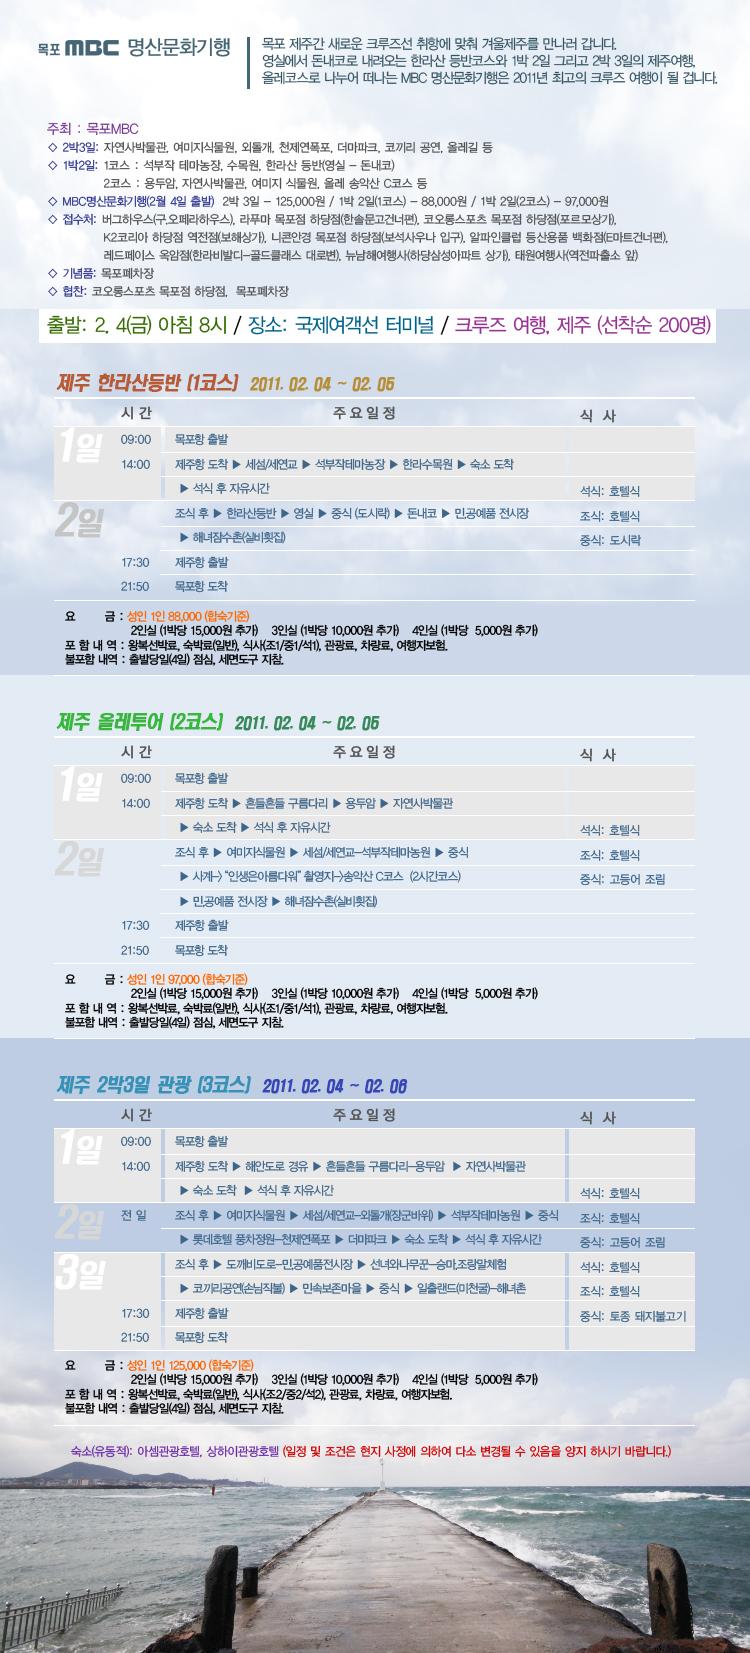 MBC 명산문화기행(목포-제주 크루즈 취항 기념) 행사정보